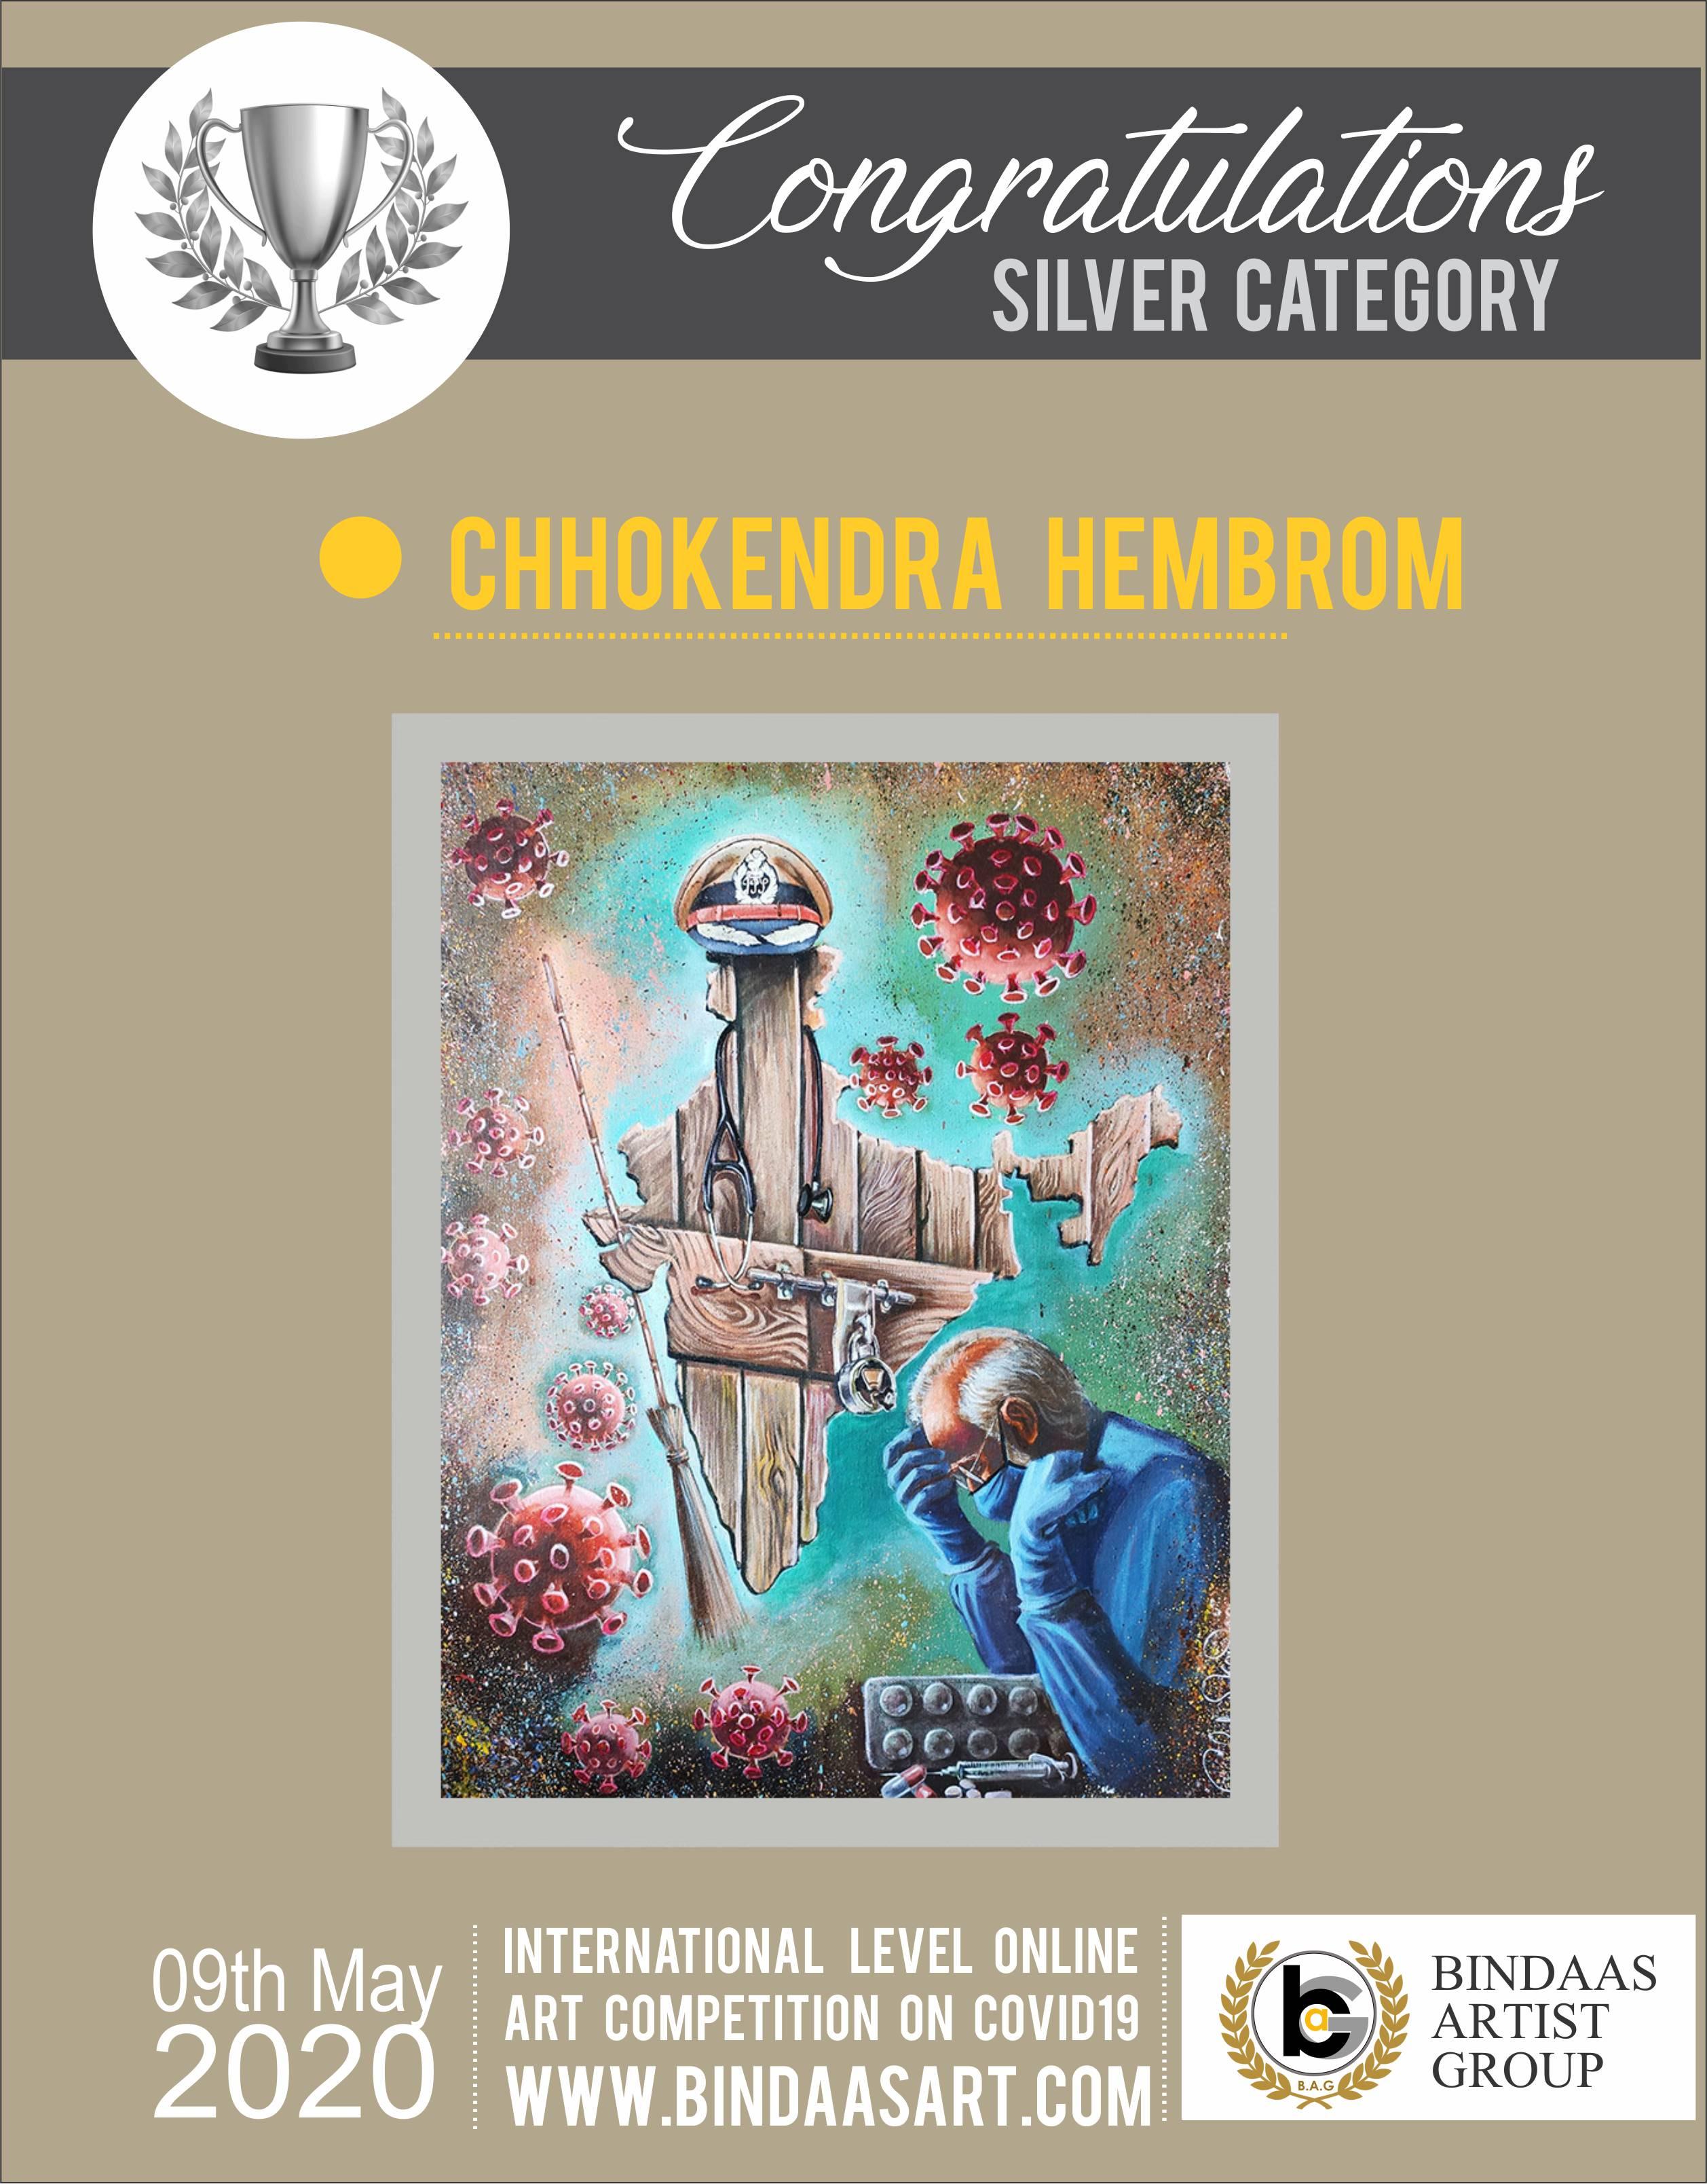 Chhokendra Hembrom